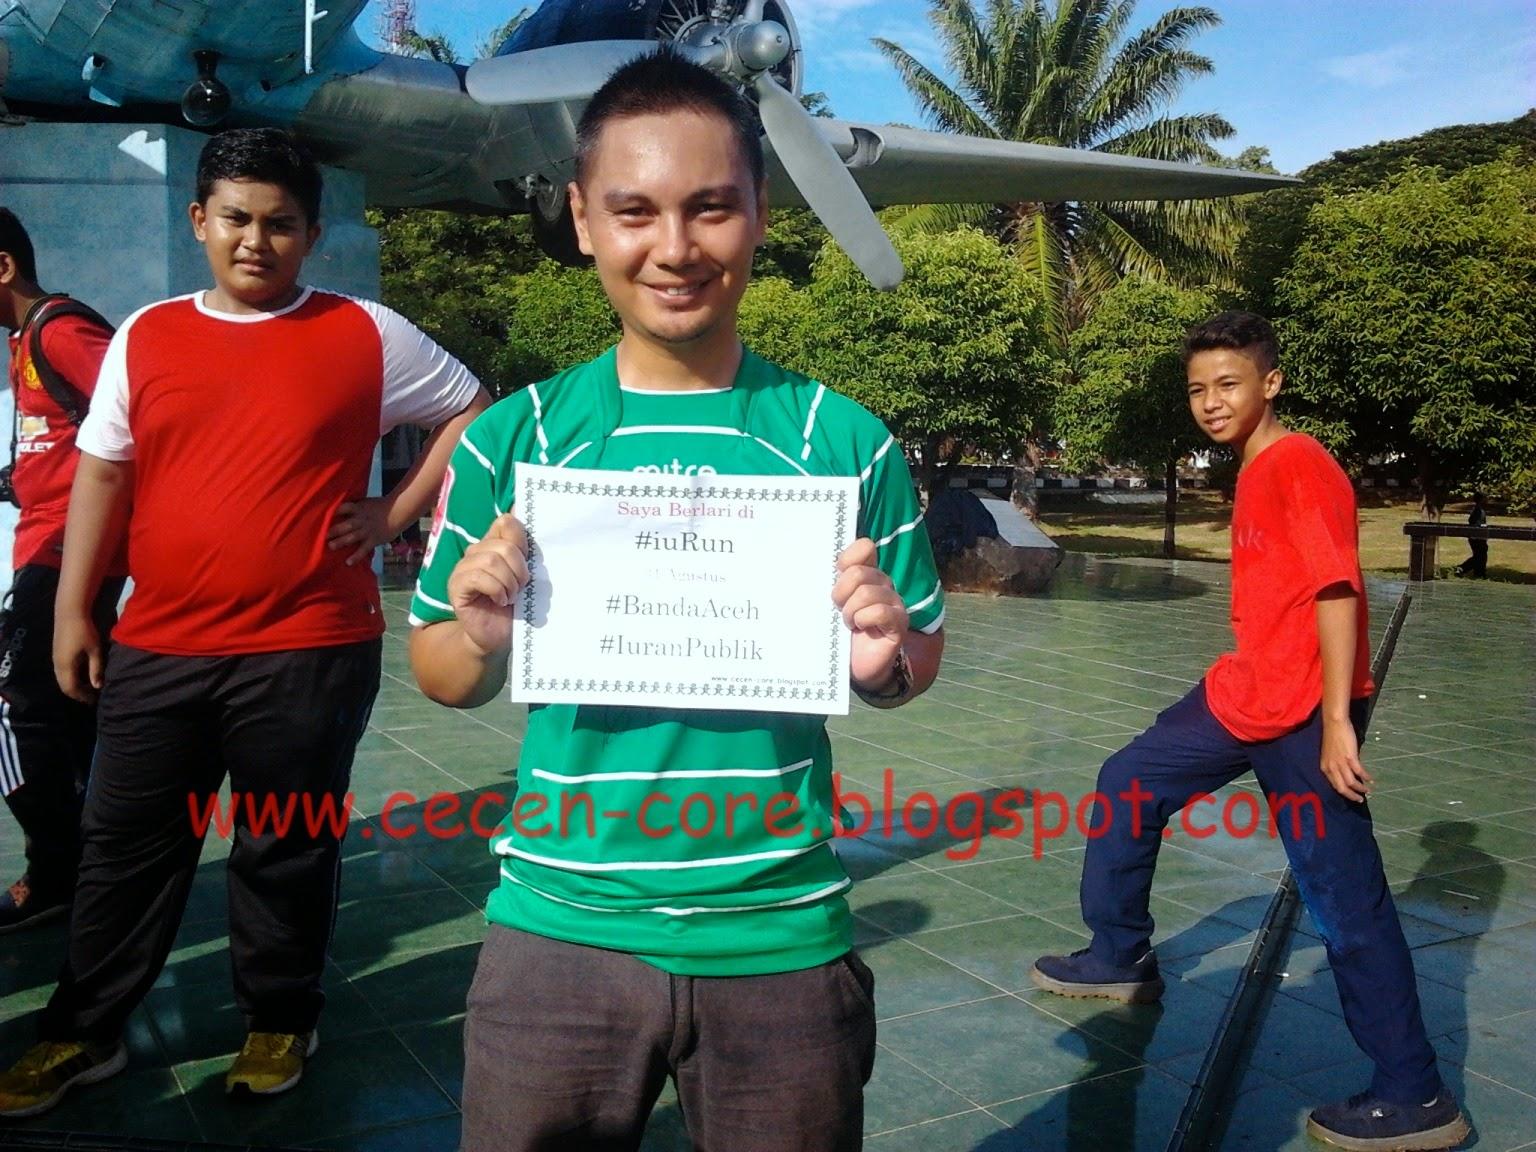 Arisandy Joan Hardiputra #iuRun Banda Aceh